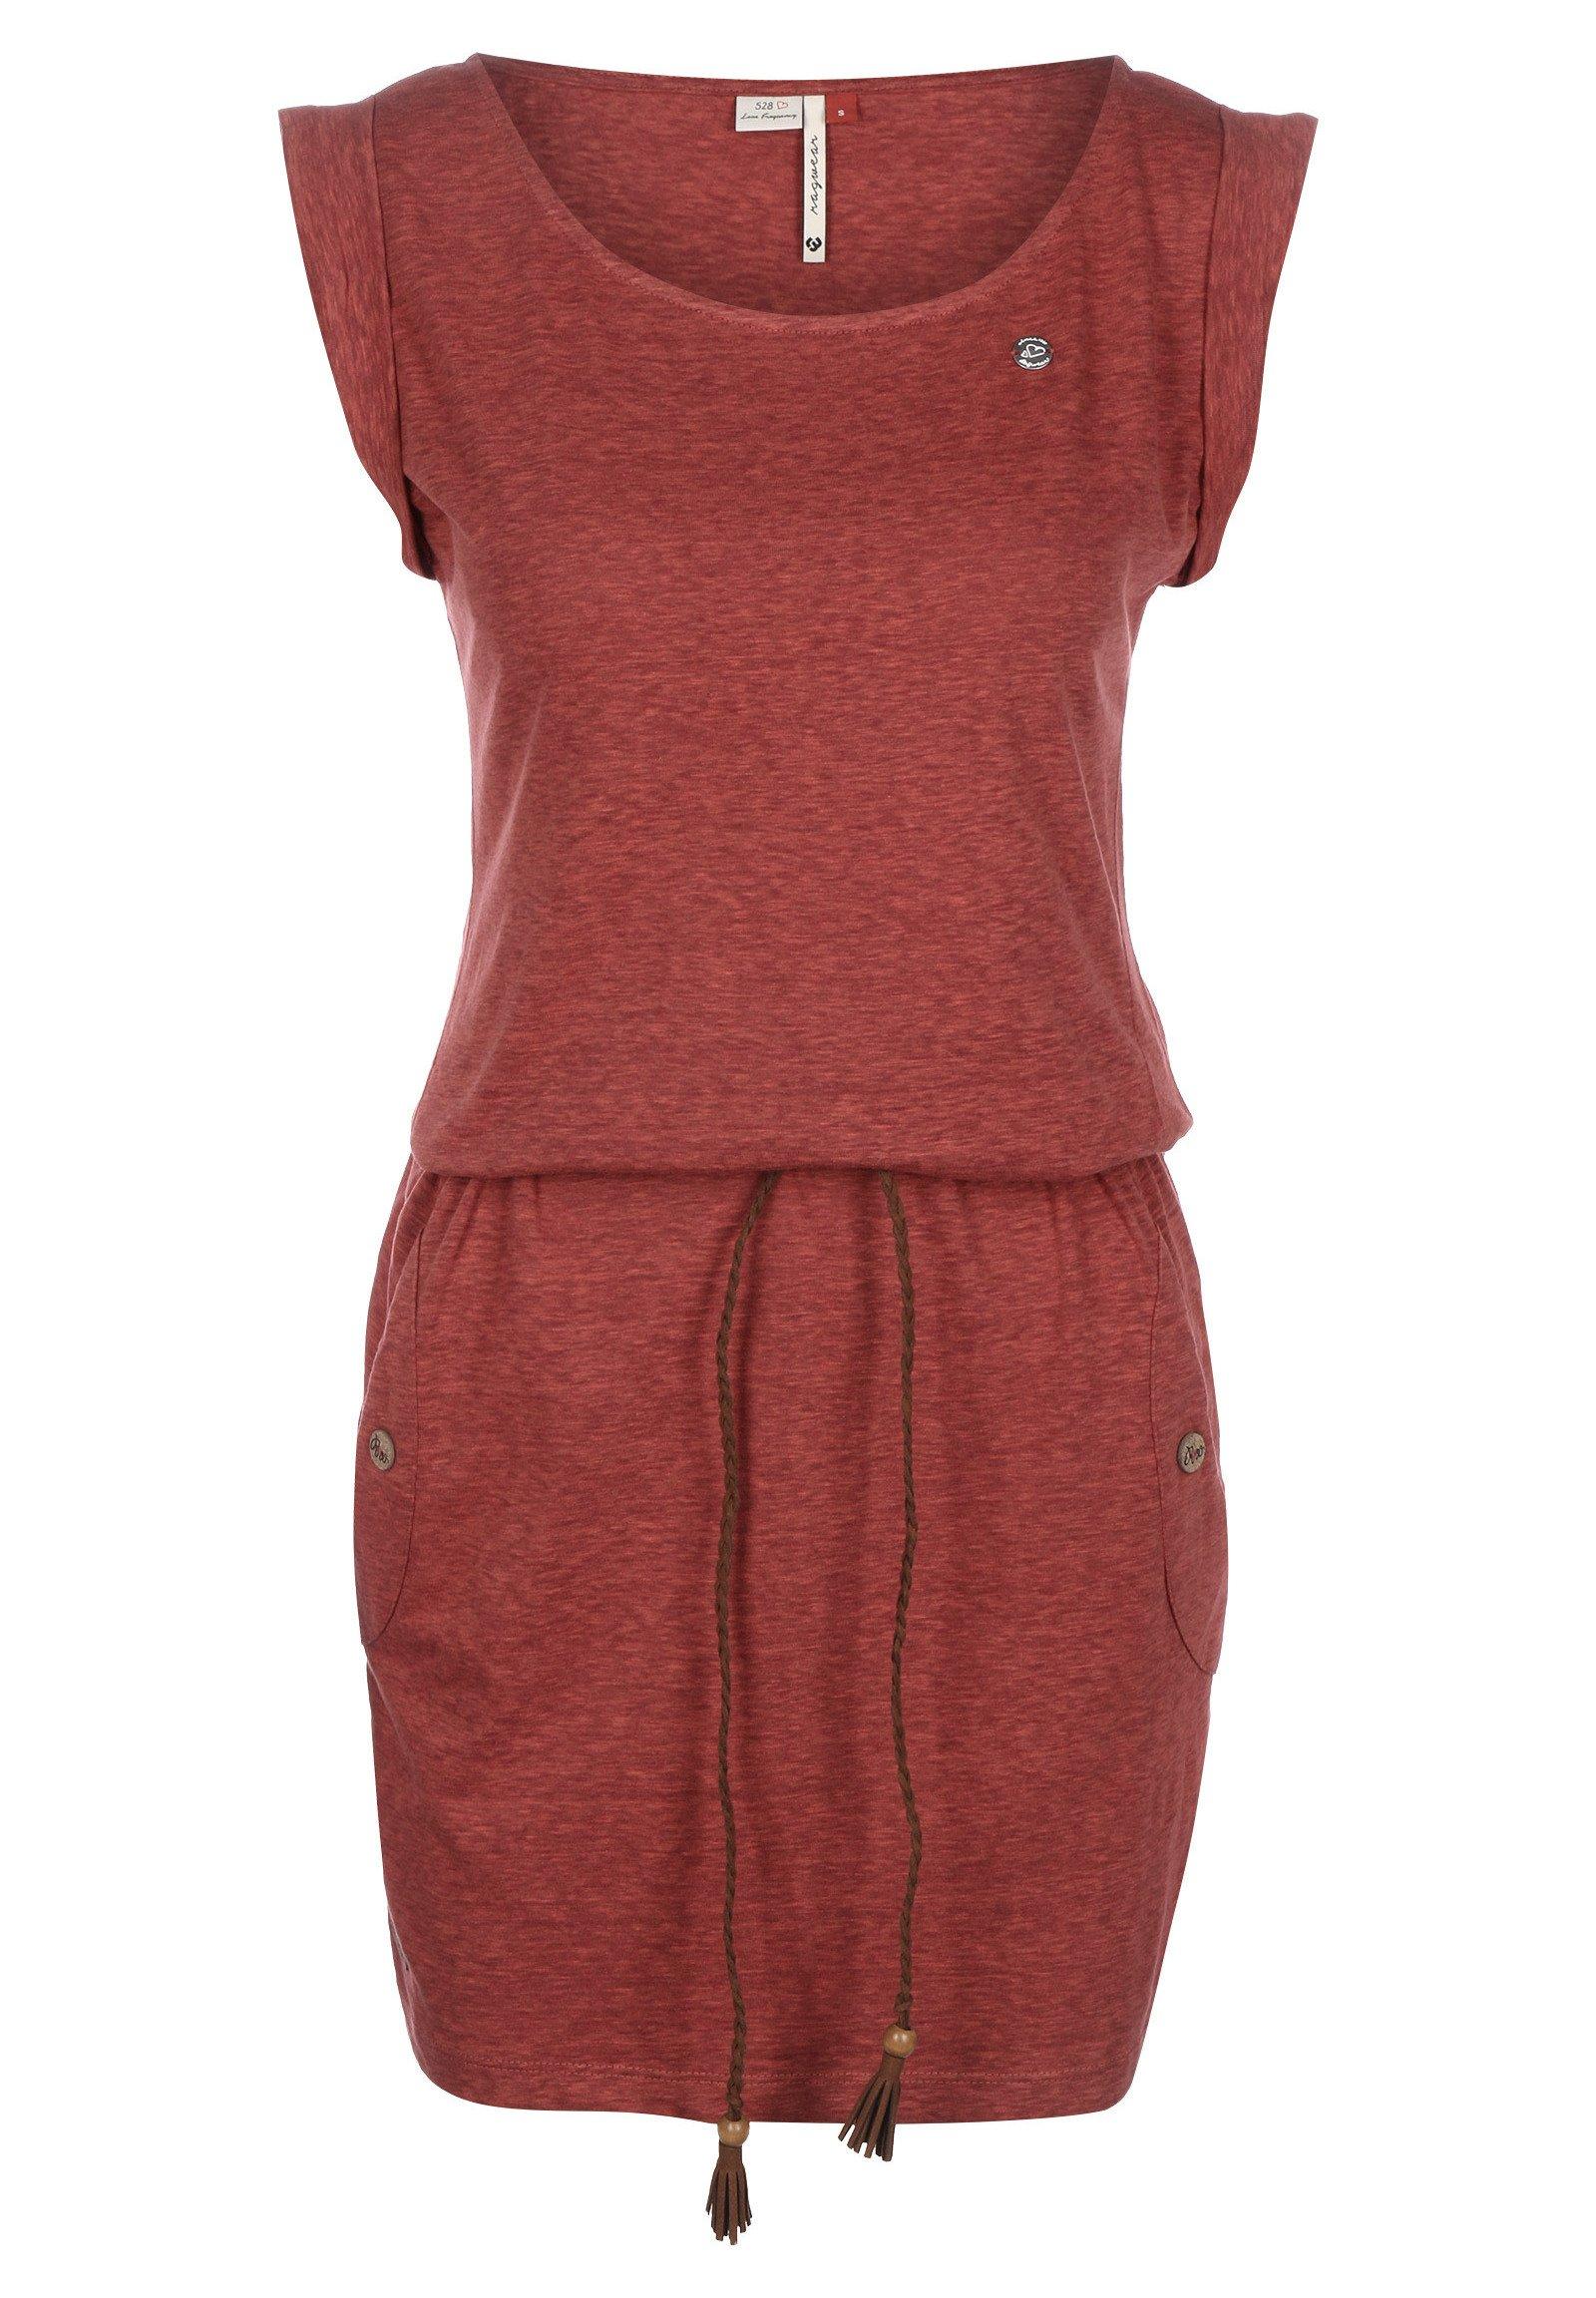 Ragwear Felow Jacket Wine Red Femmes Veste D/'Hiver Veste Capuche Rouge